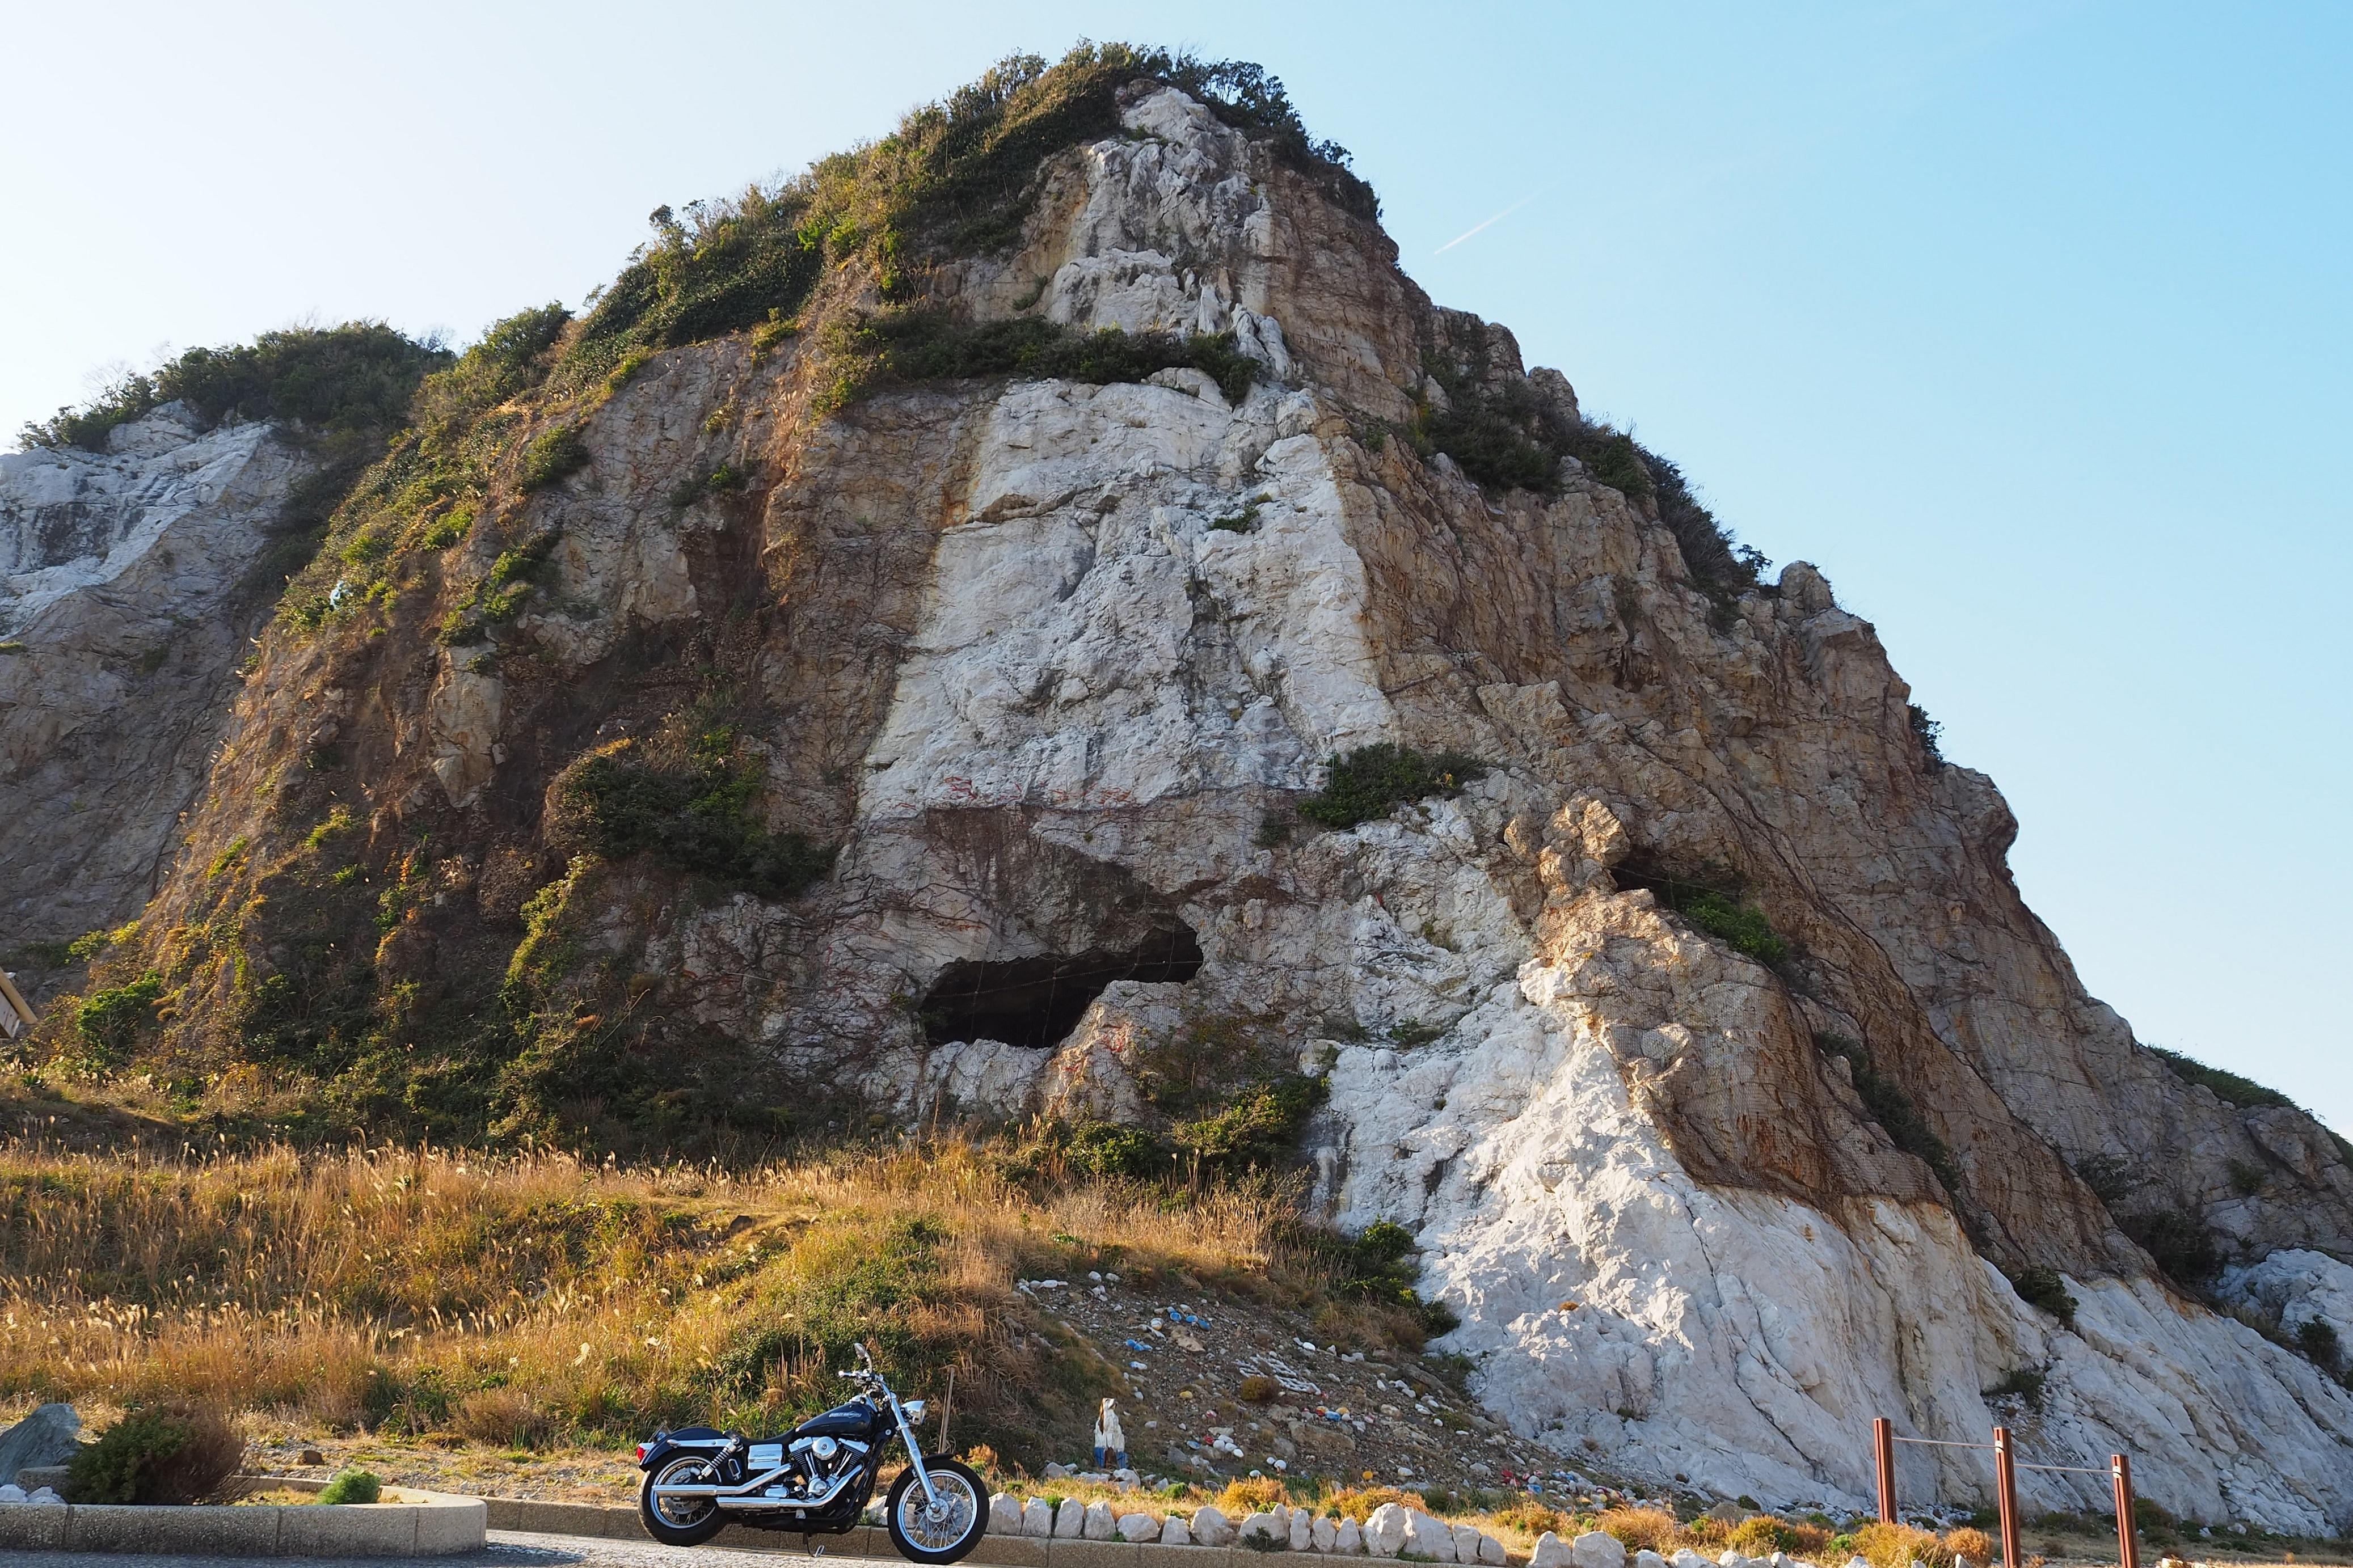 harleydavidson-motorcycle-touring-blog-shirasakioceanpark-navalbase-tunnel.jpg